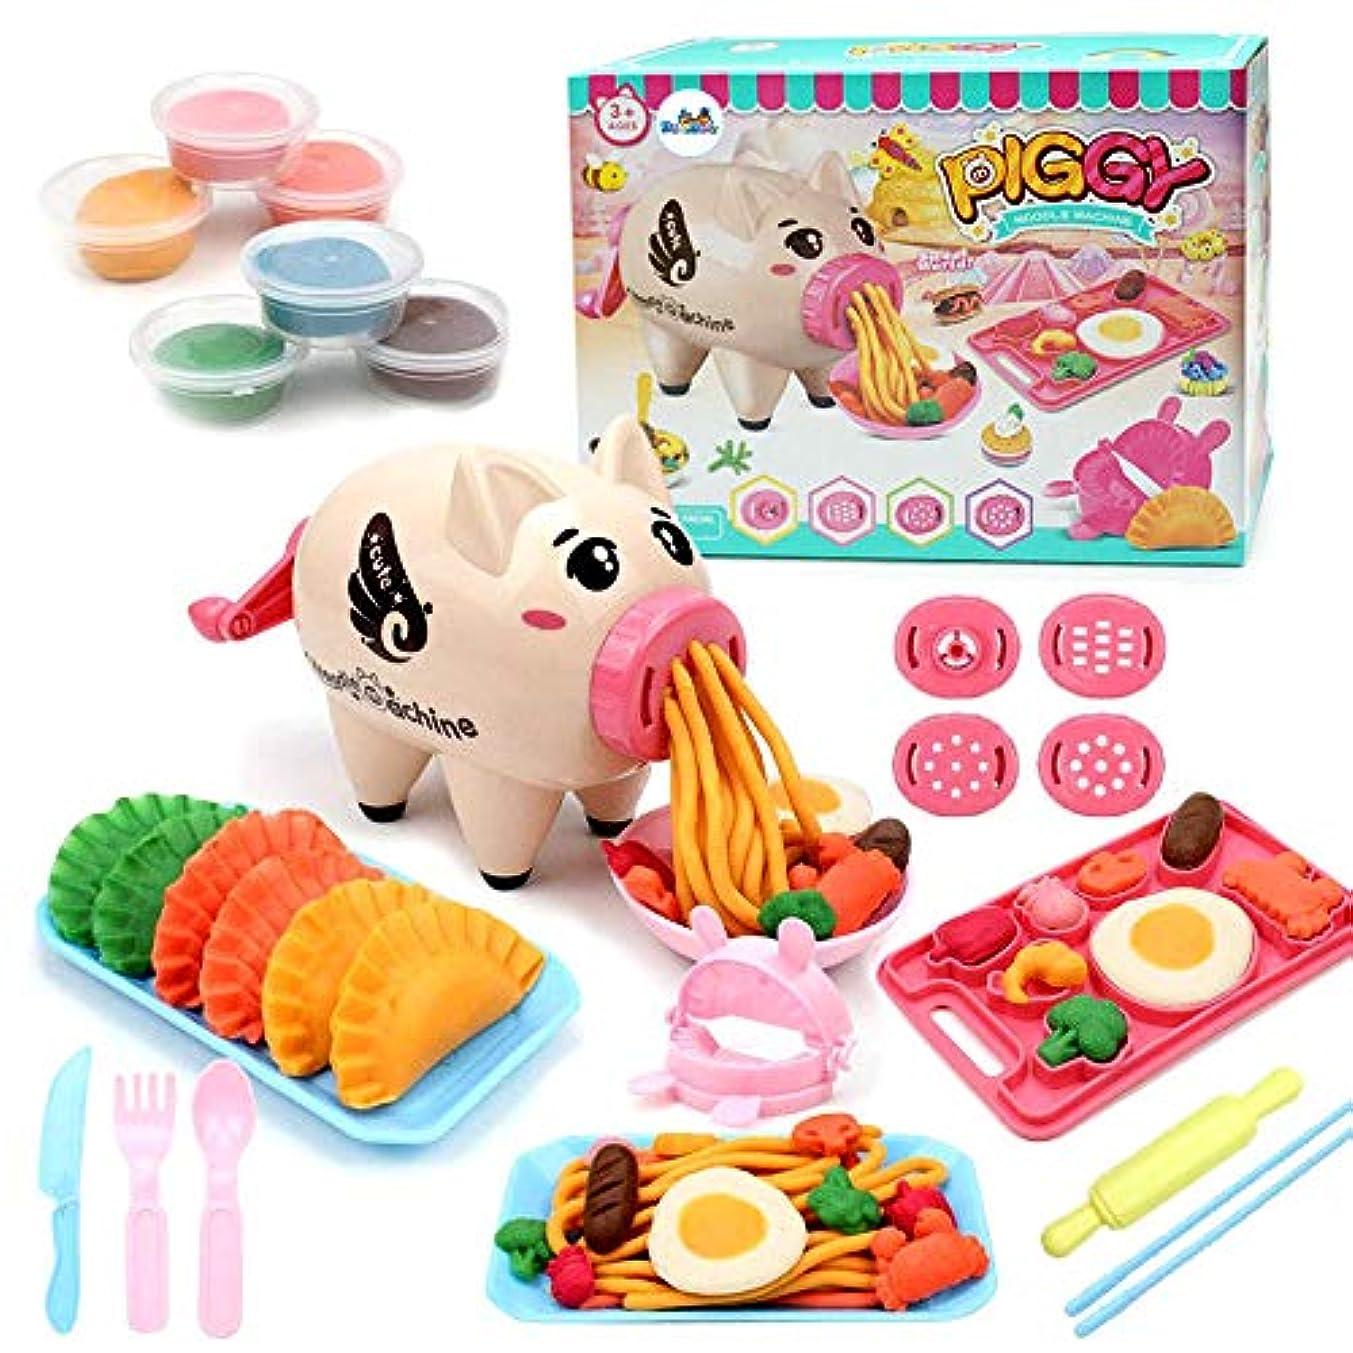 Deardeer 粘土遊びセット 非毒性 おままごとセット ヌードルマシン 楽しいキッチンおもちゃ 子供用 21個